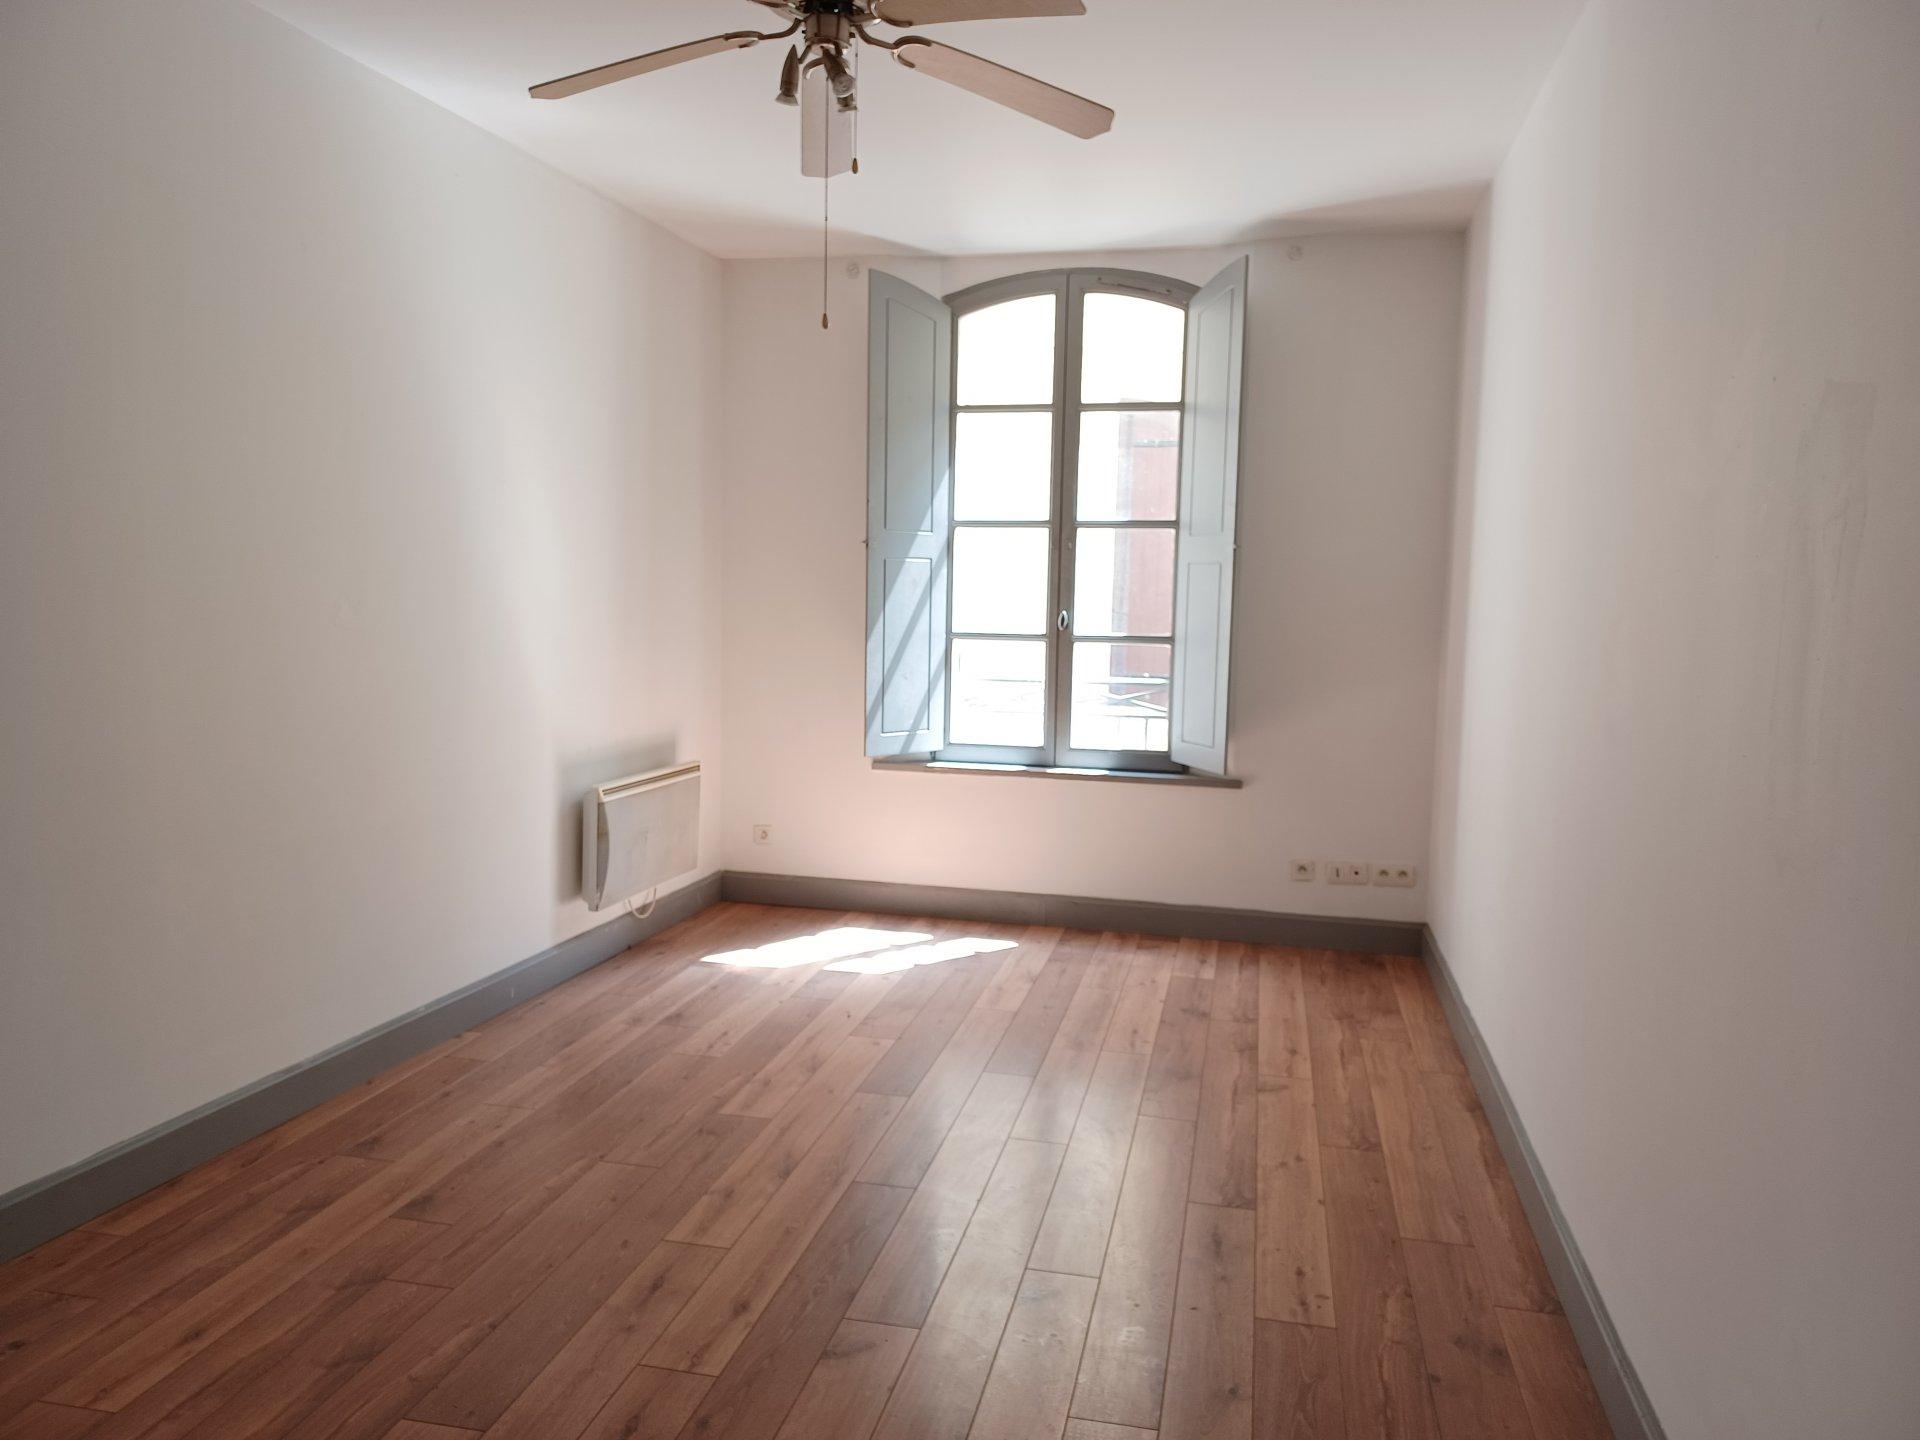 Location Appartement BEAUCAIRE Mandat : 1009-104